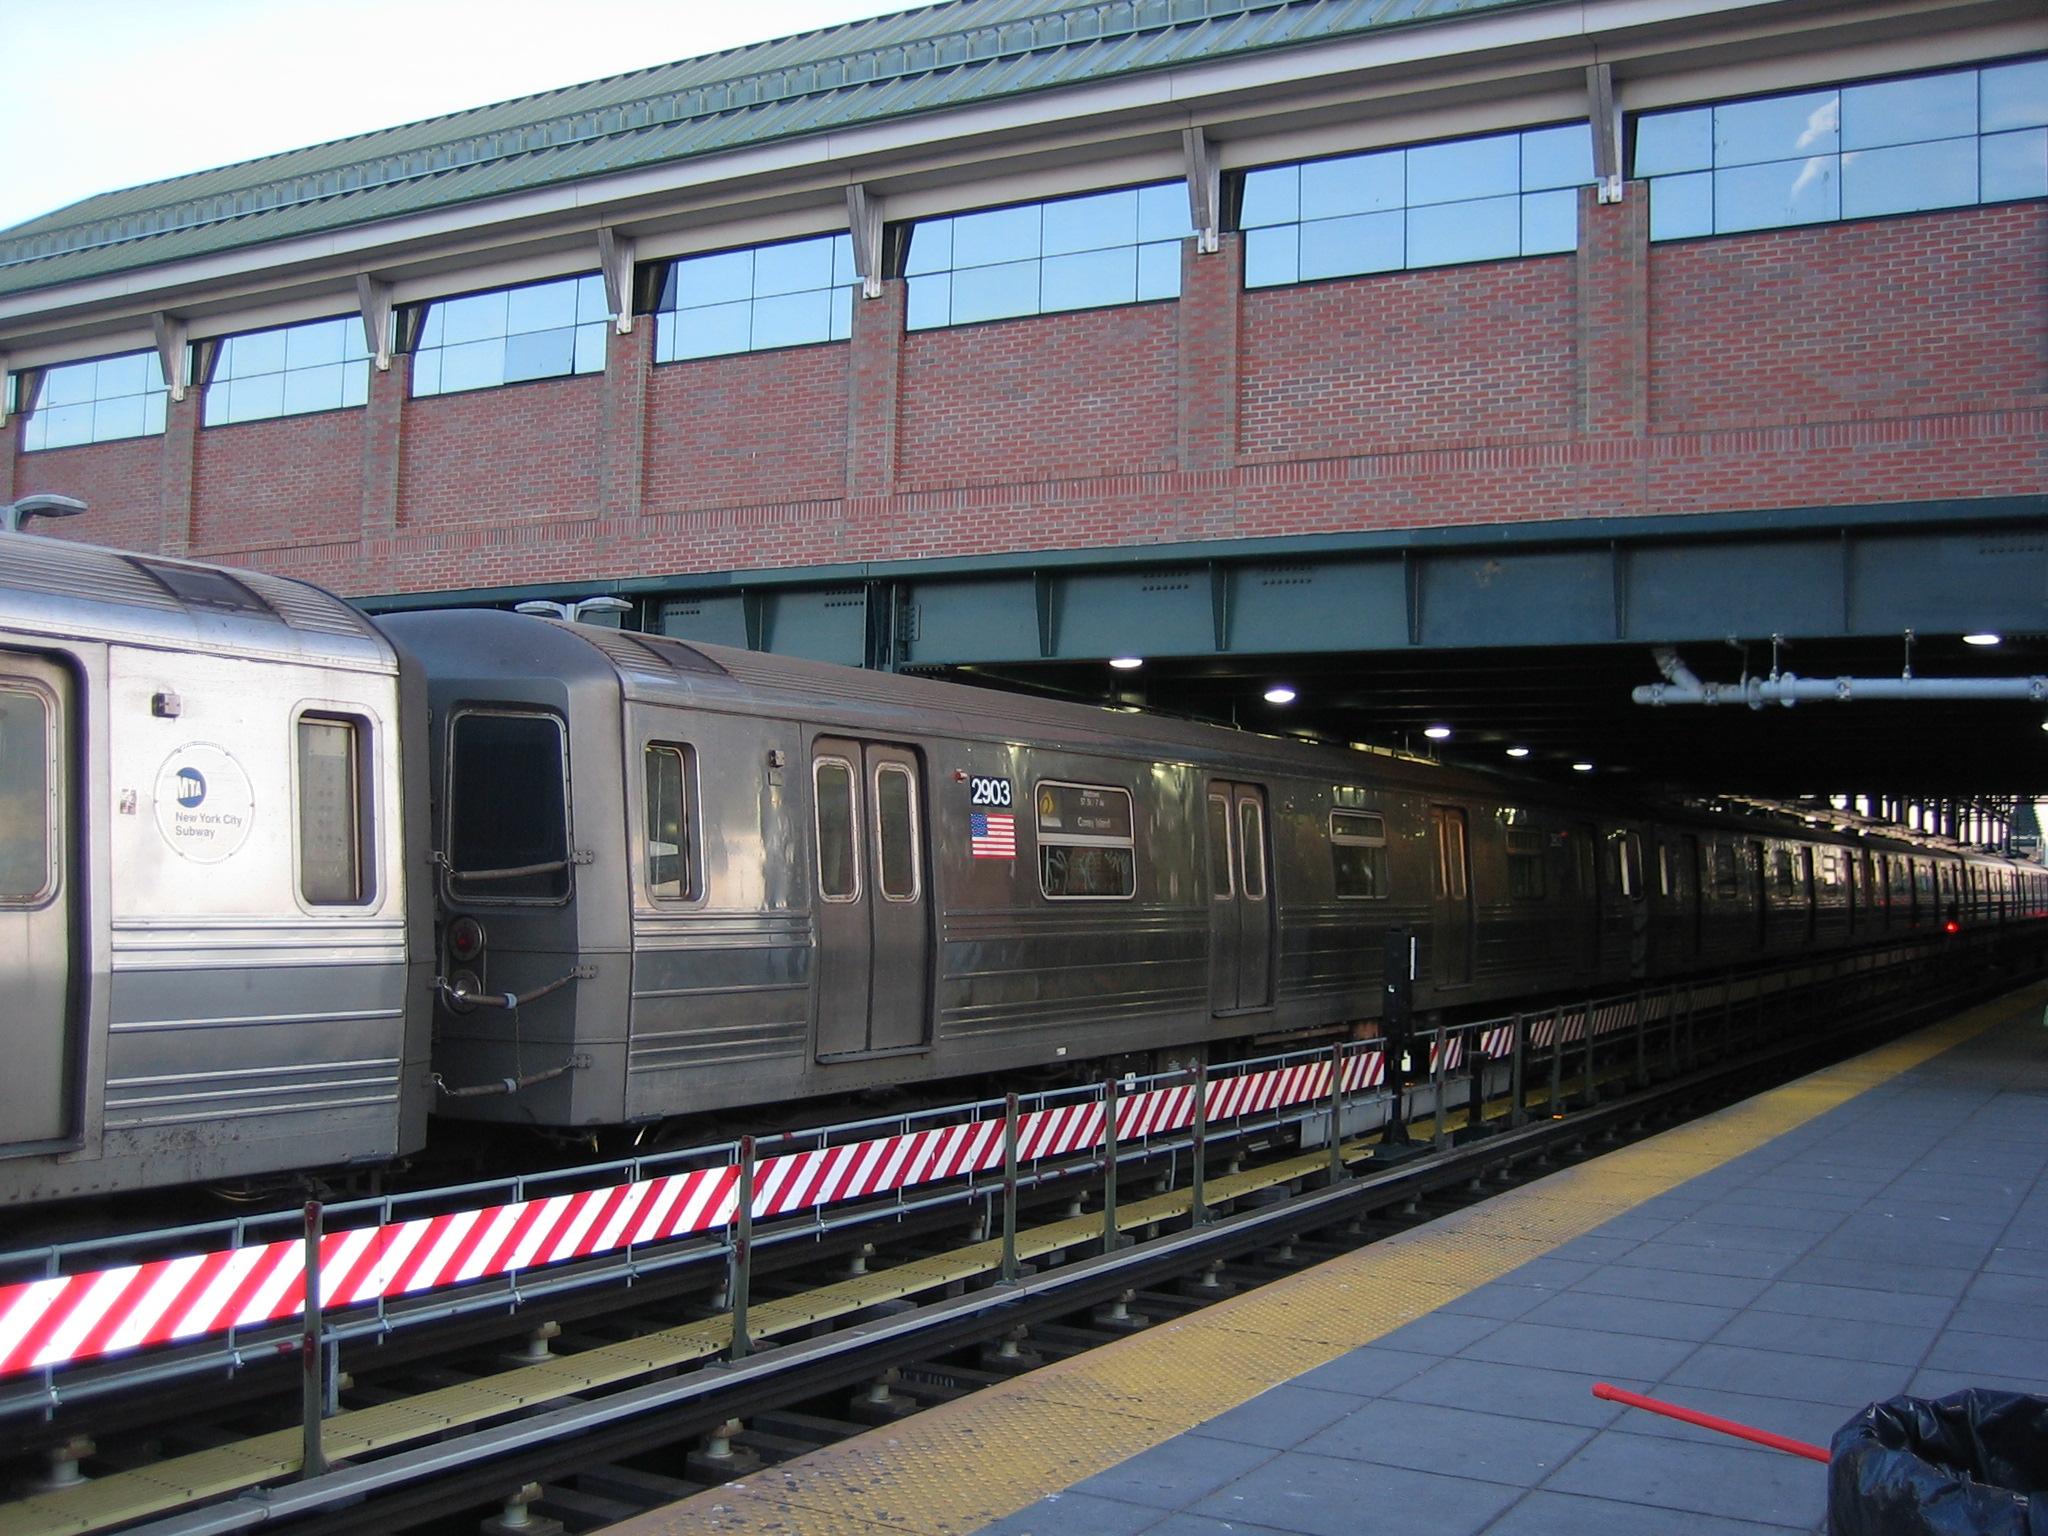 (927k, 2048x1536)<br><b>Country:</b> United States<br><b>City:</b> New York<br><b>System:</b> New York City Transit<br><b>Location:</b> Coney Island/Stillwell Avenue<br><b>Route:</b> Q<br><b>Car:</b> R-68 (Westinghouse-Amrail, 1986-1988)  2903 <br><b>Photo by:</b> Michael Hodurski<br><b>Date:</b> 3/17/2006<br><b>Viewed (this week/total):</b> 1 / 2204